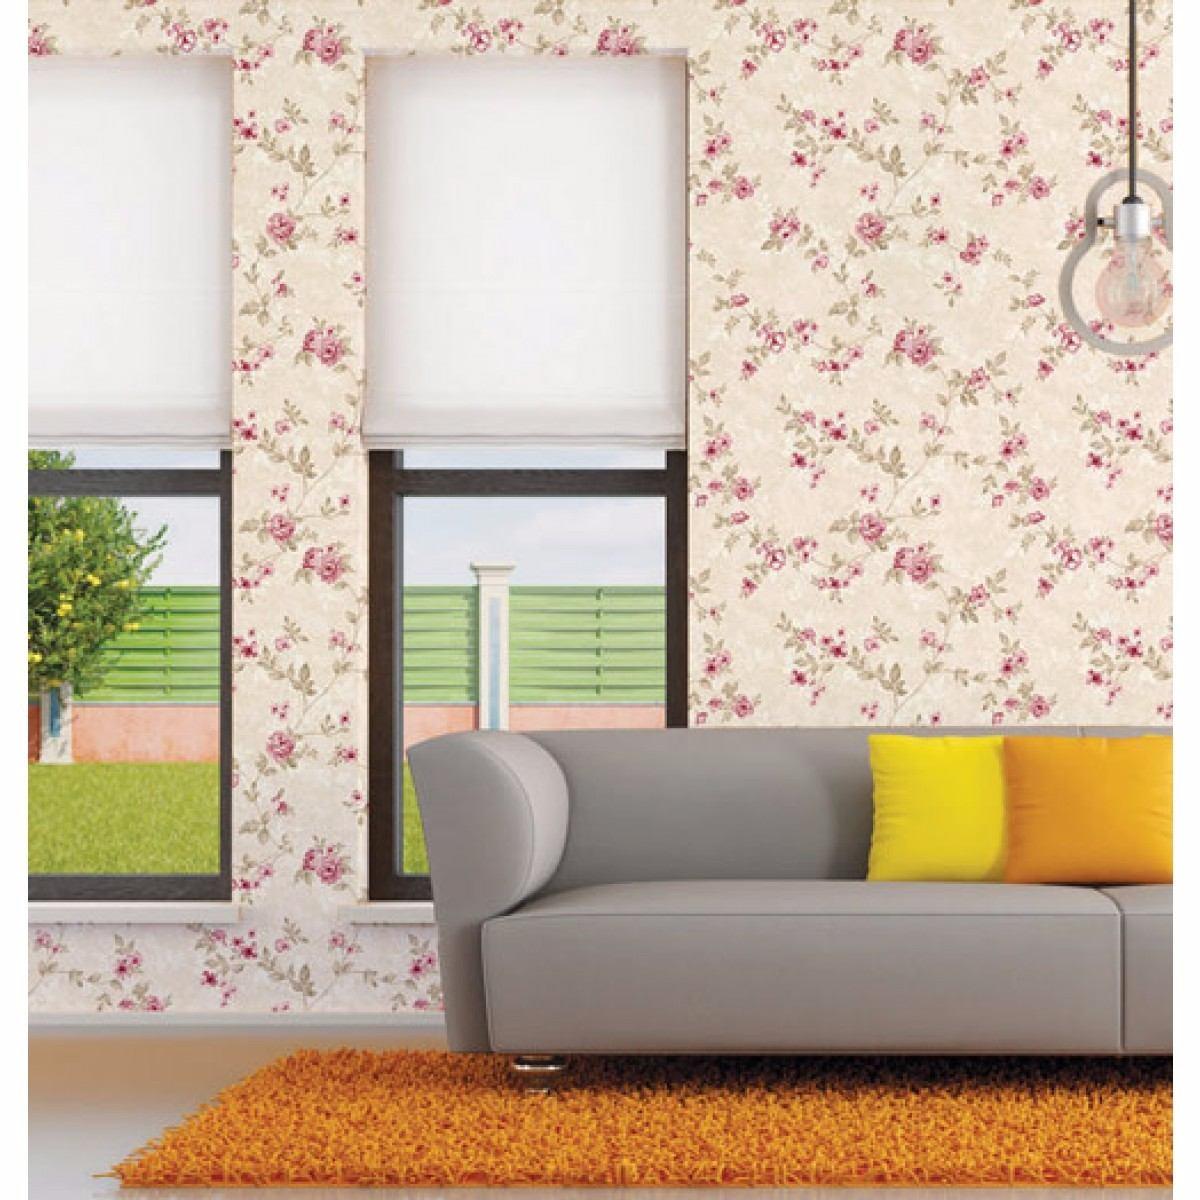 Papel de parede floral rosa adesivo contact vin lico - Vinilico para paredes ...